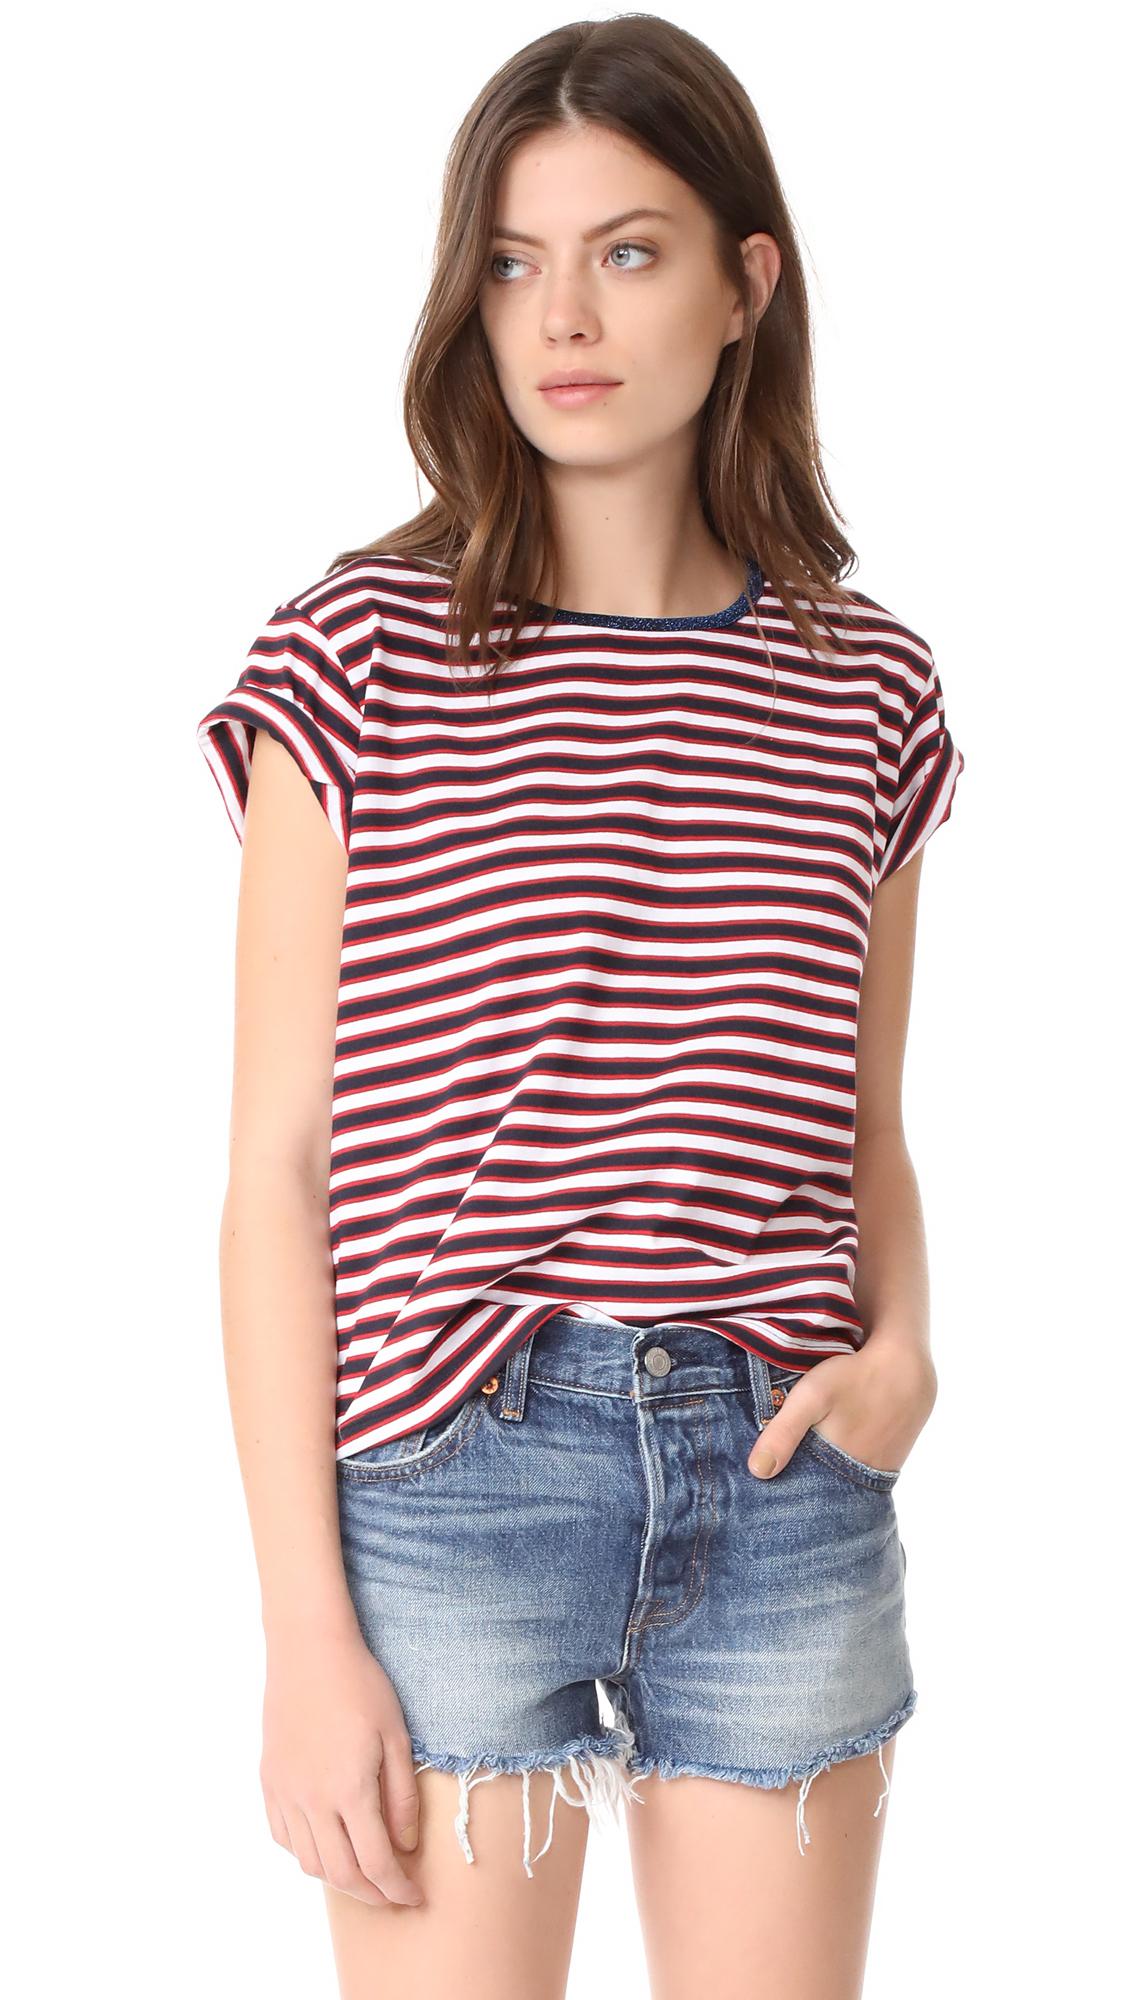 Liana Clothing Sister Stria Tee - Red, White & Blue Stripes